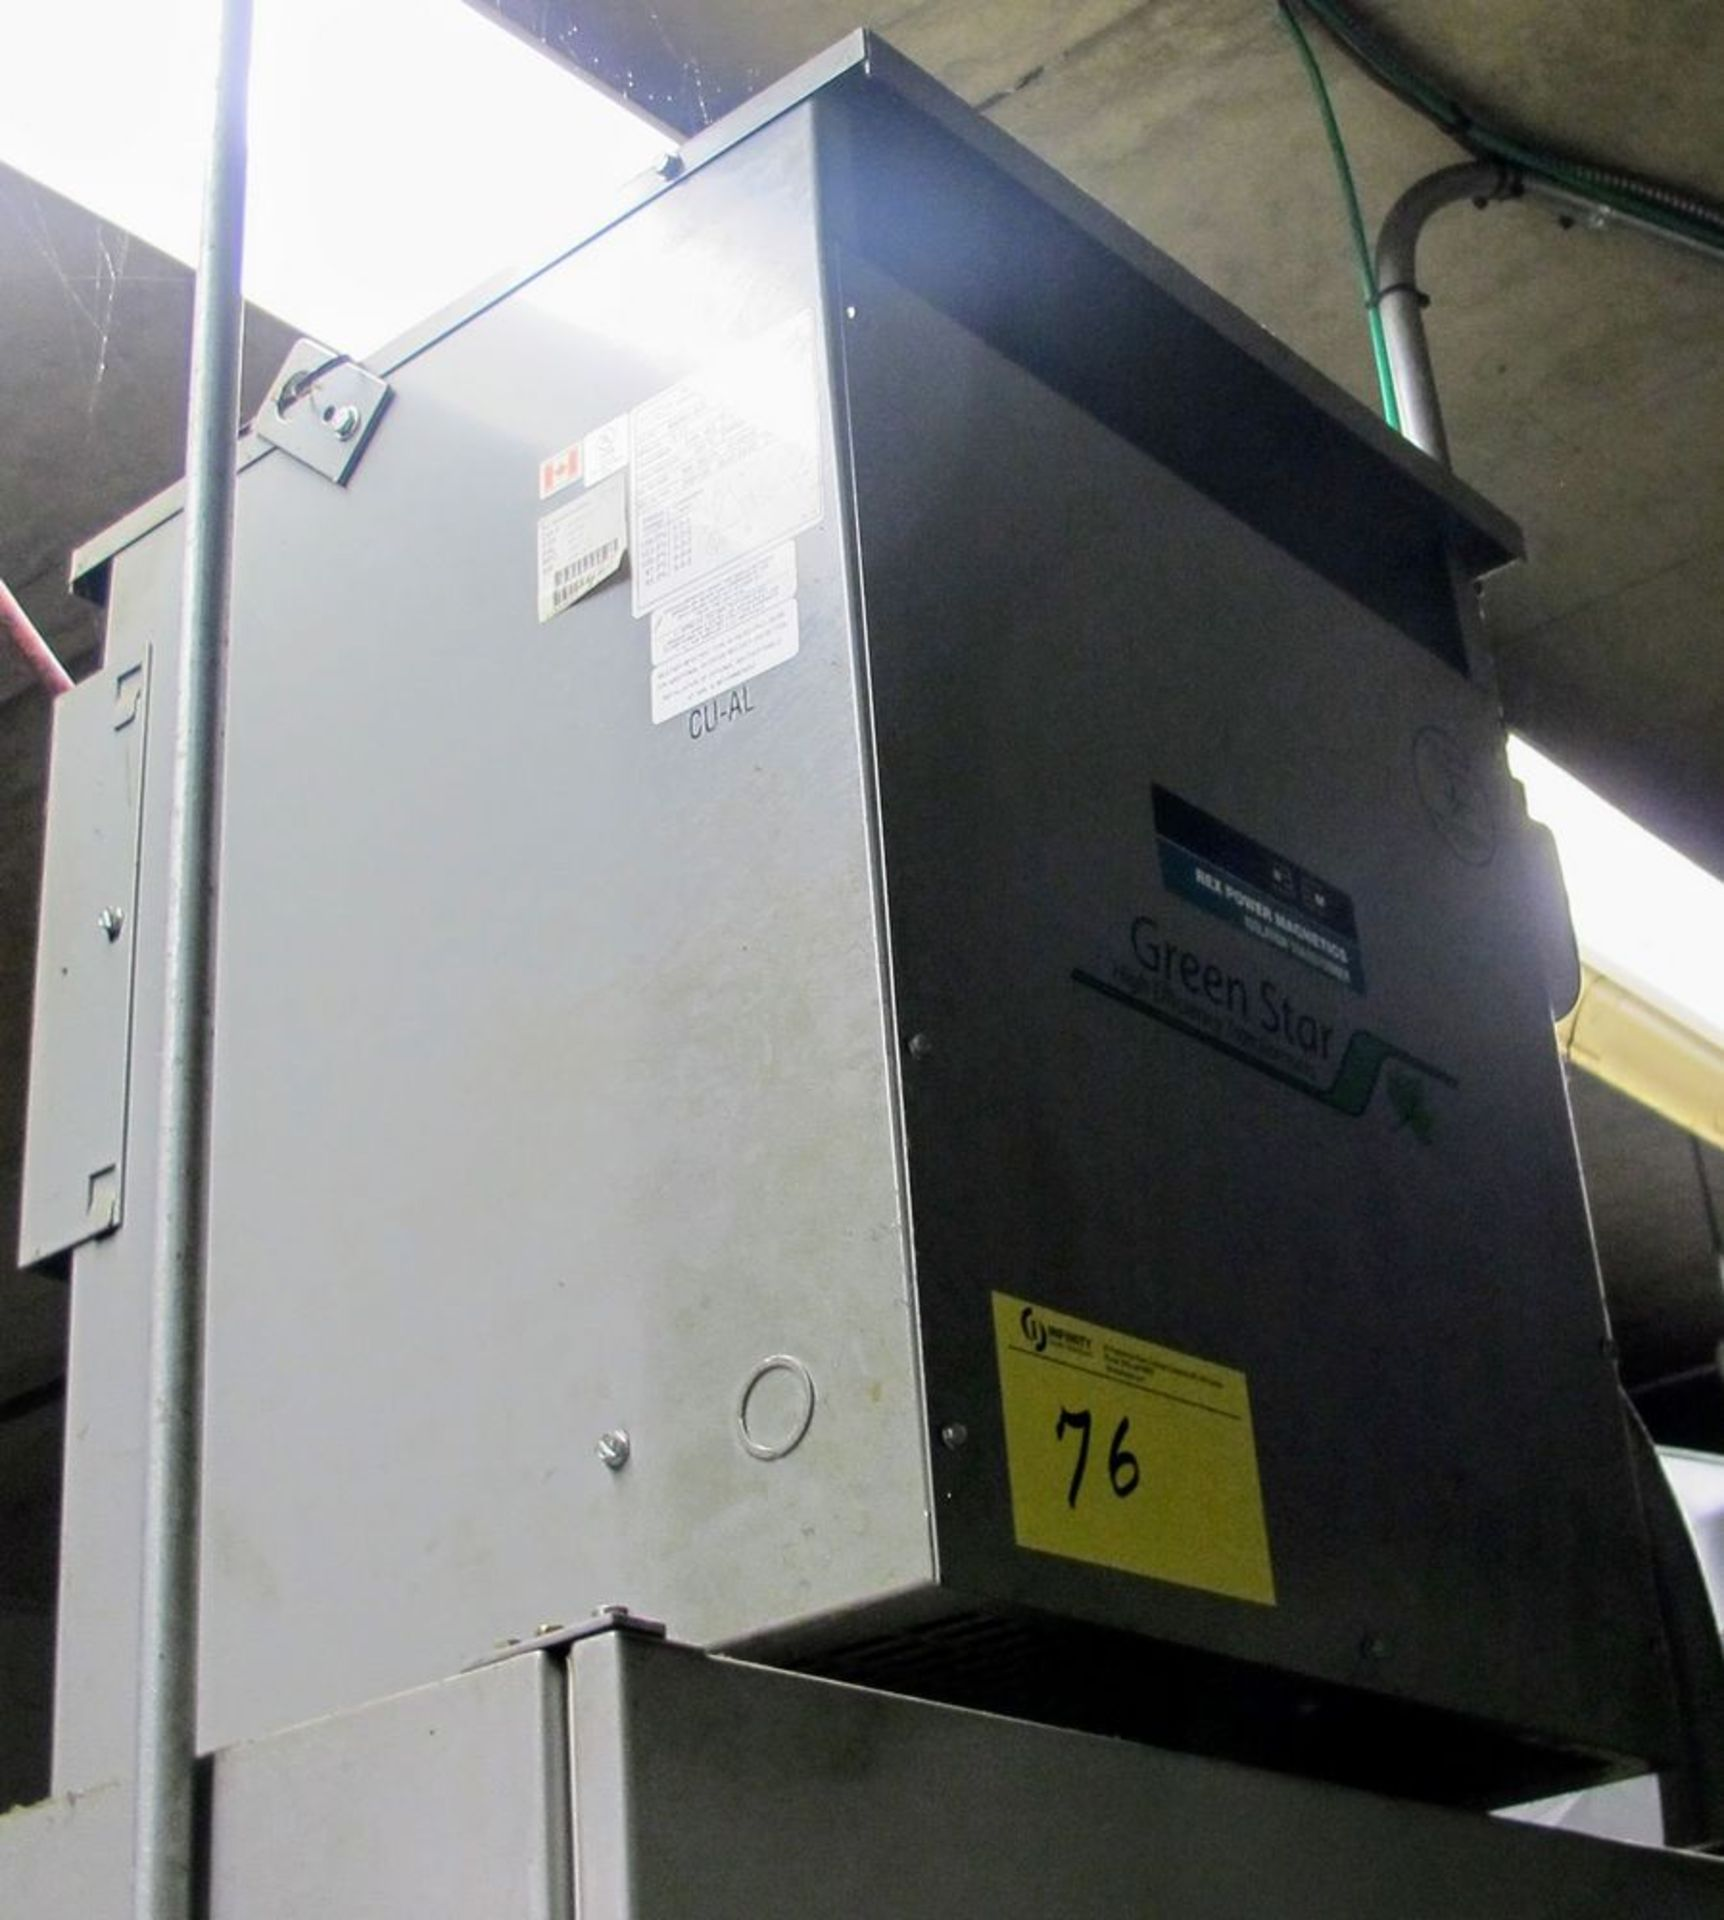 Lot 76 - REX POWER MAGNETICS TRANSFORMER, 30KVA, 600V PRIMARY, 208/120 SECONDARY